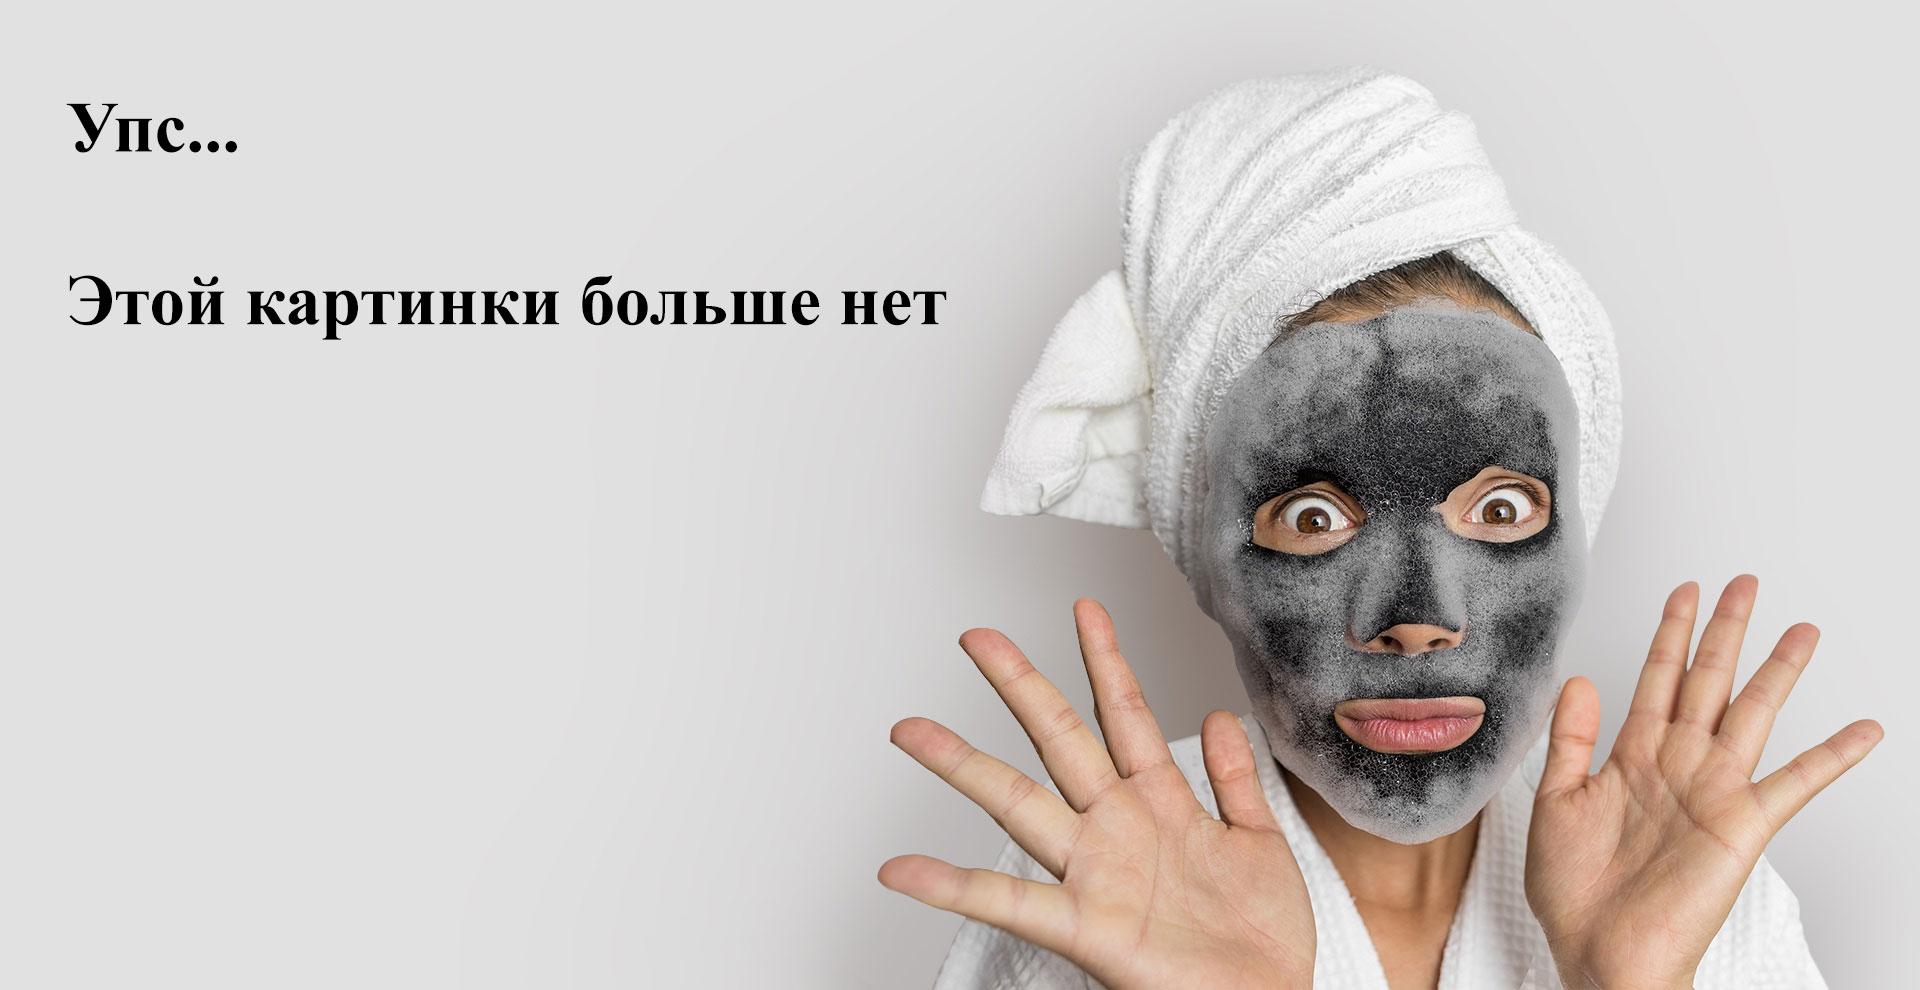 Egomania, Маска для волос RichaiR Moisture Infusion, 250 мл (УЦЕНКА)